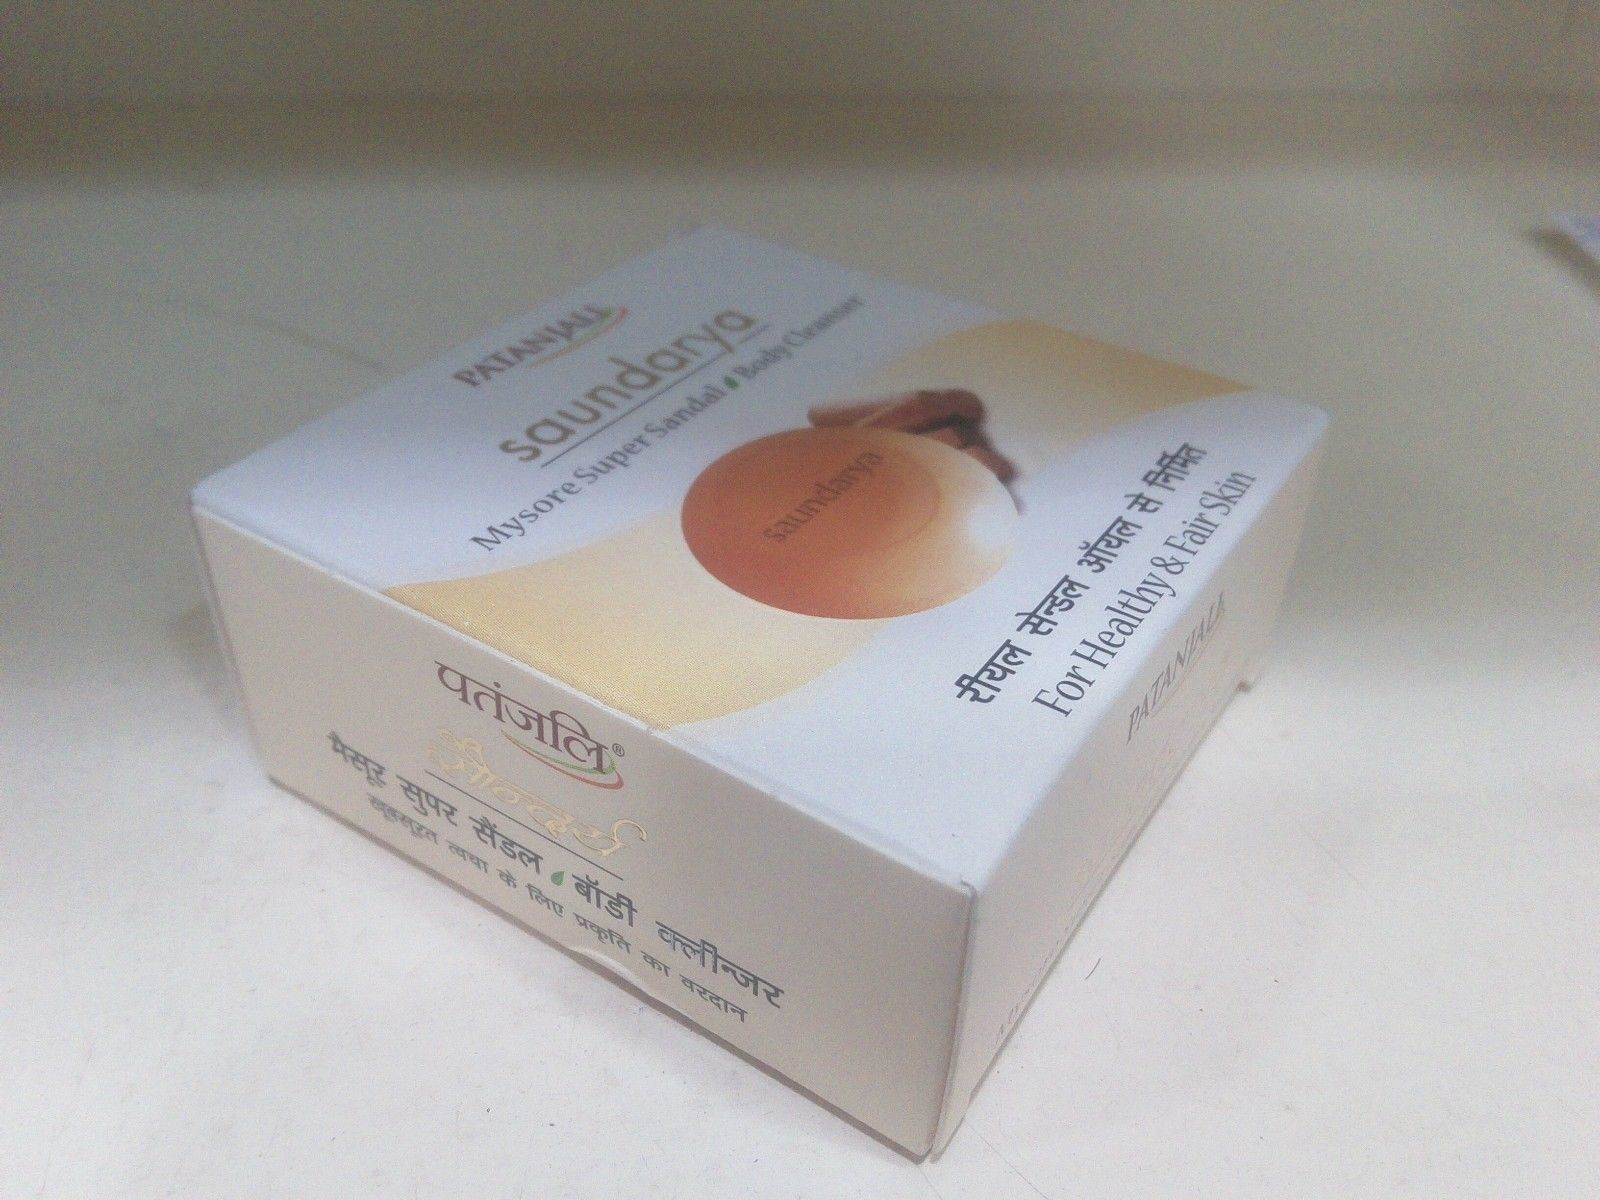 Patanjali Saundrya Sandal Soap 2x75gm Free Shipping